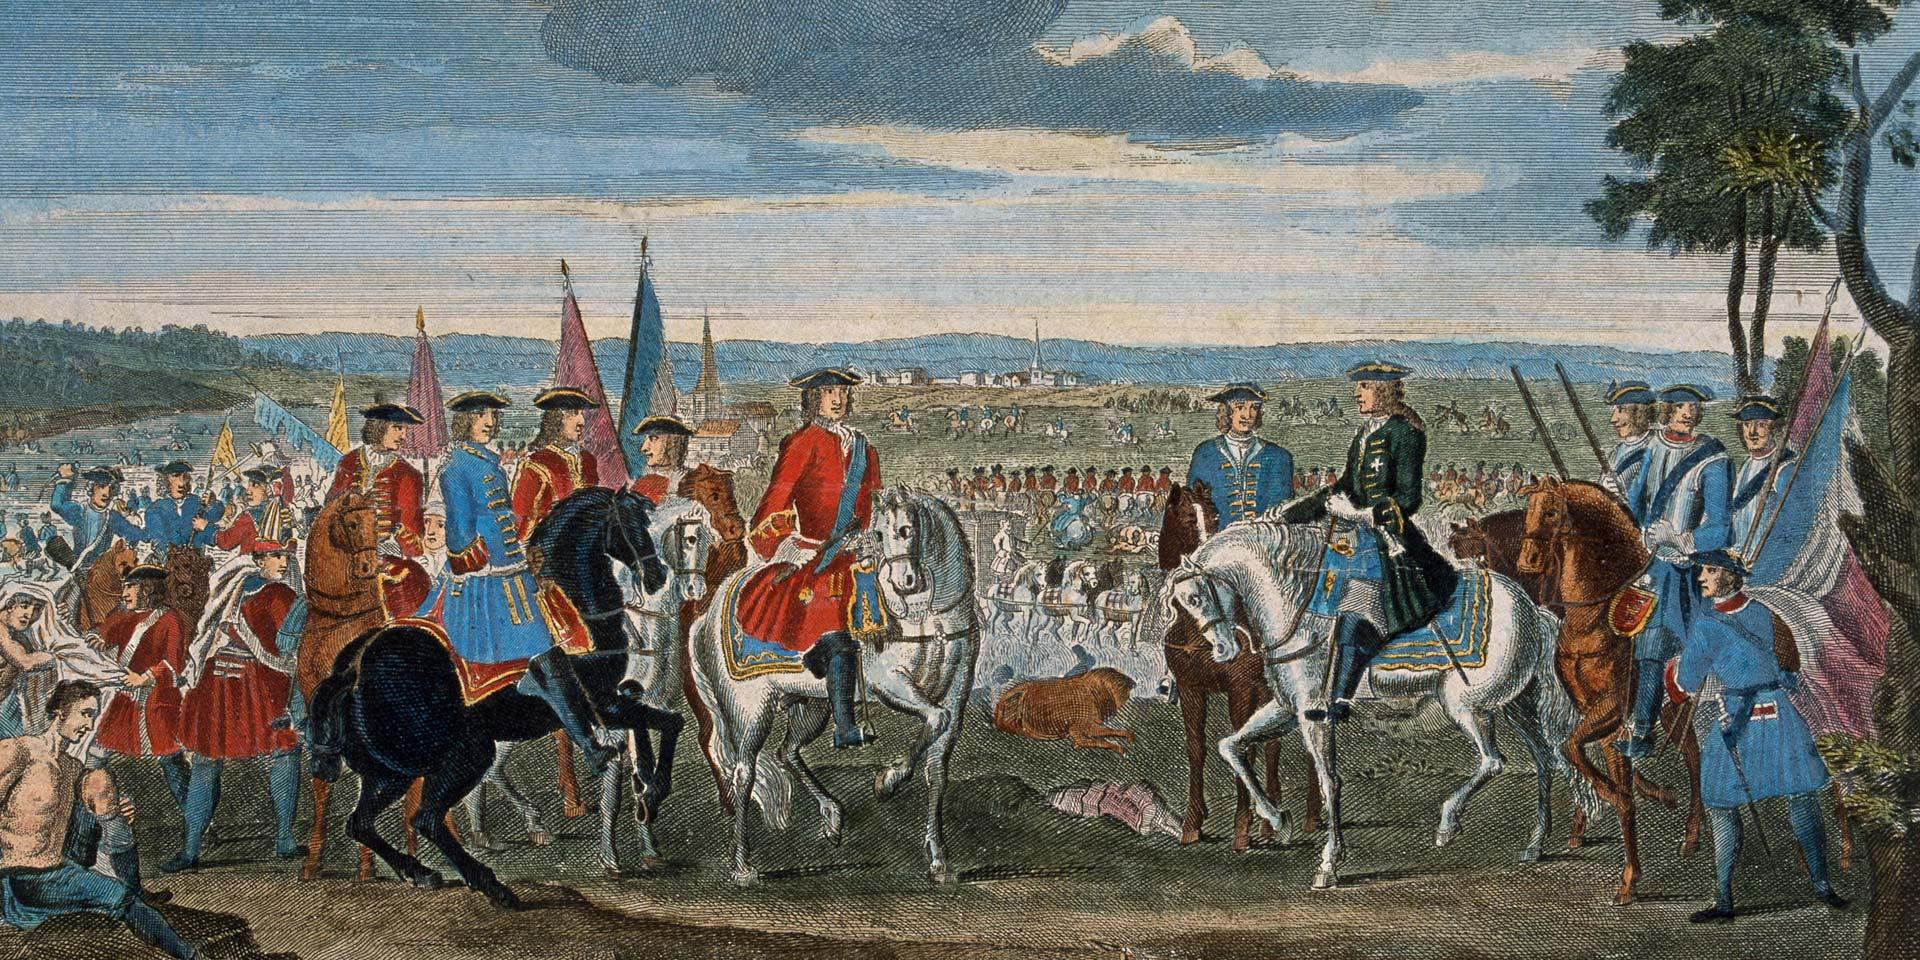 The capture of Marshal Tallard at Blenheim, 1704